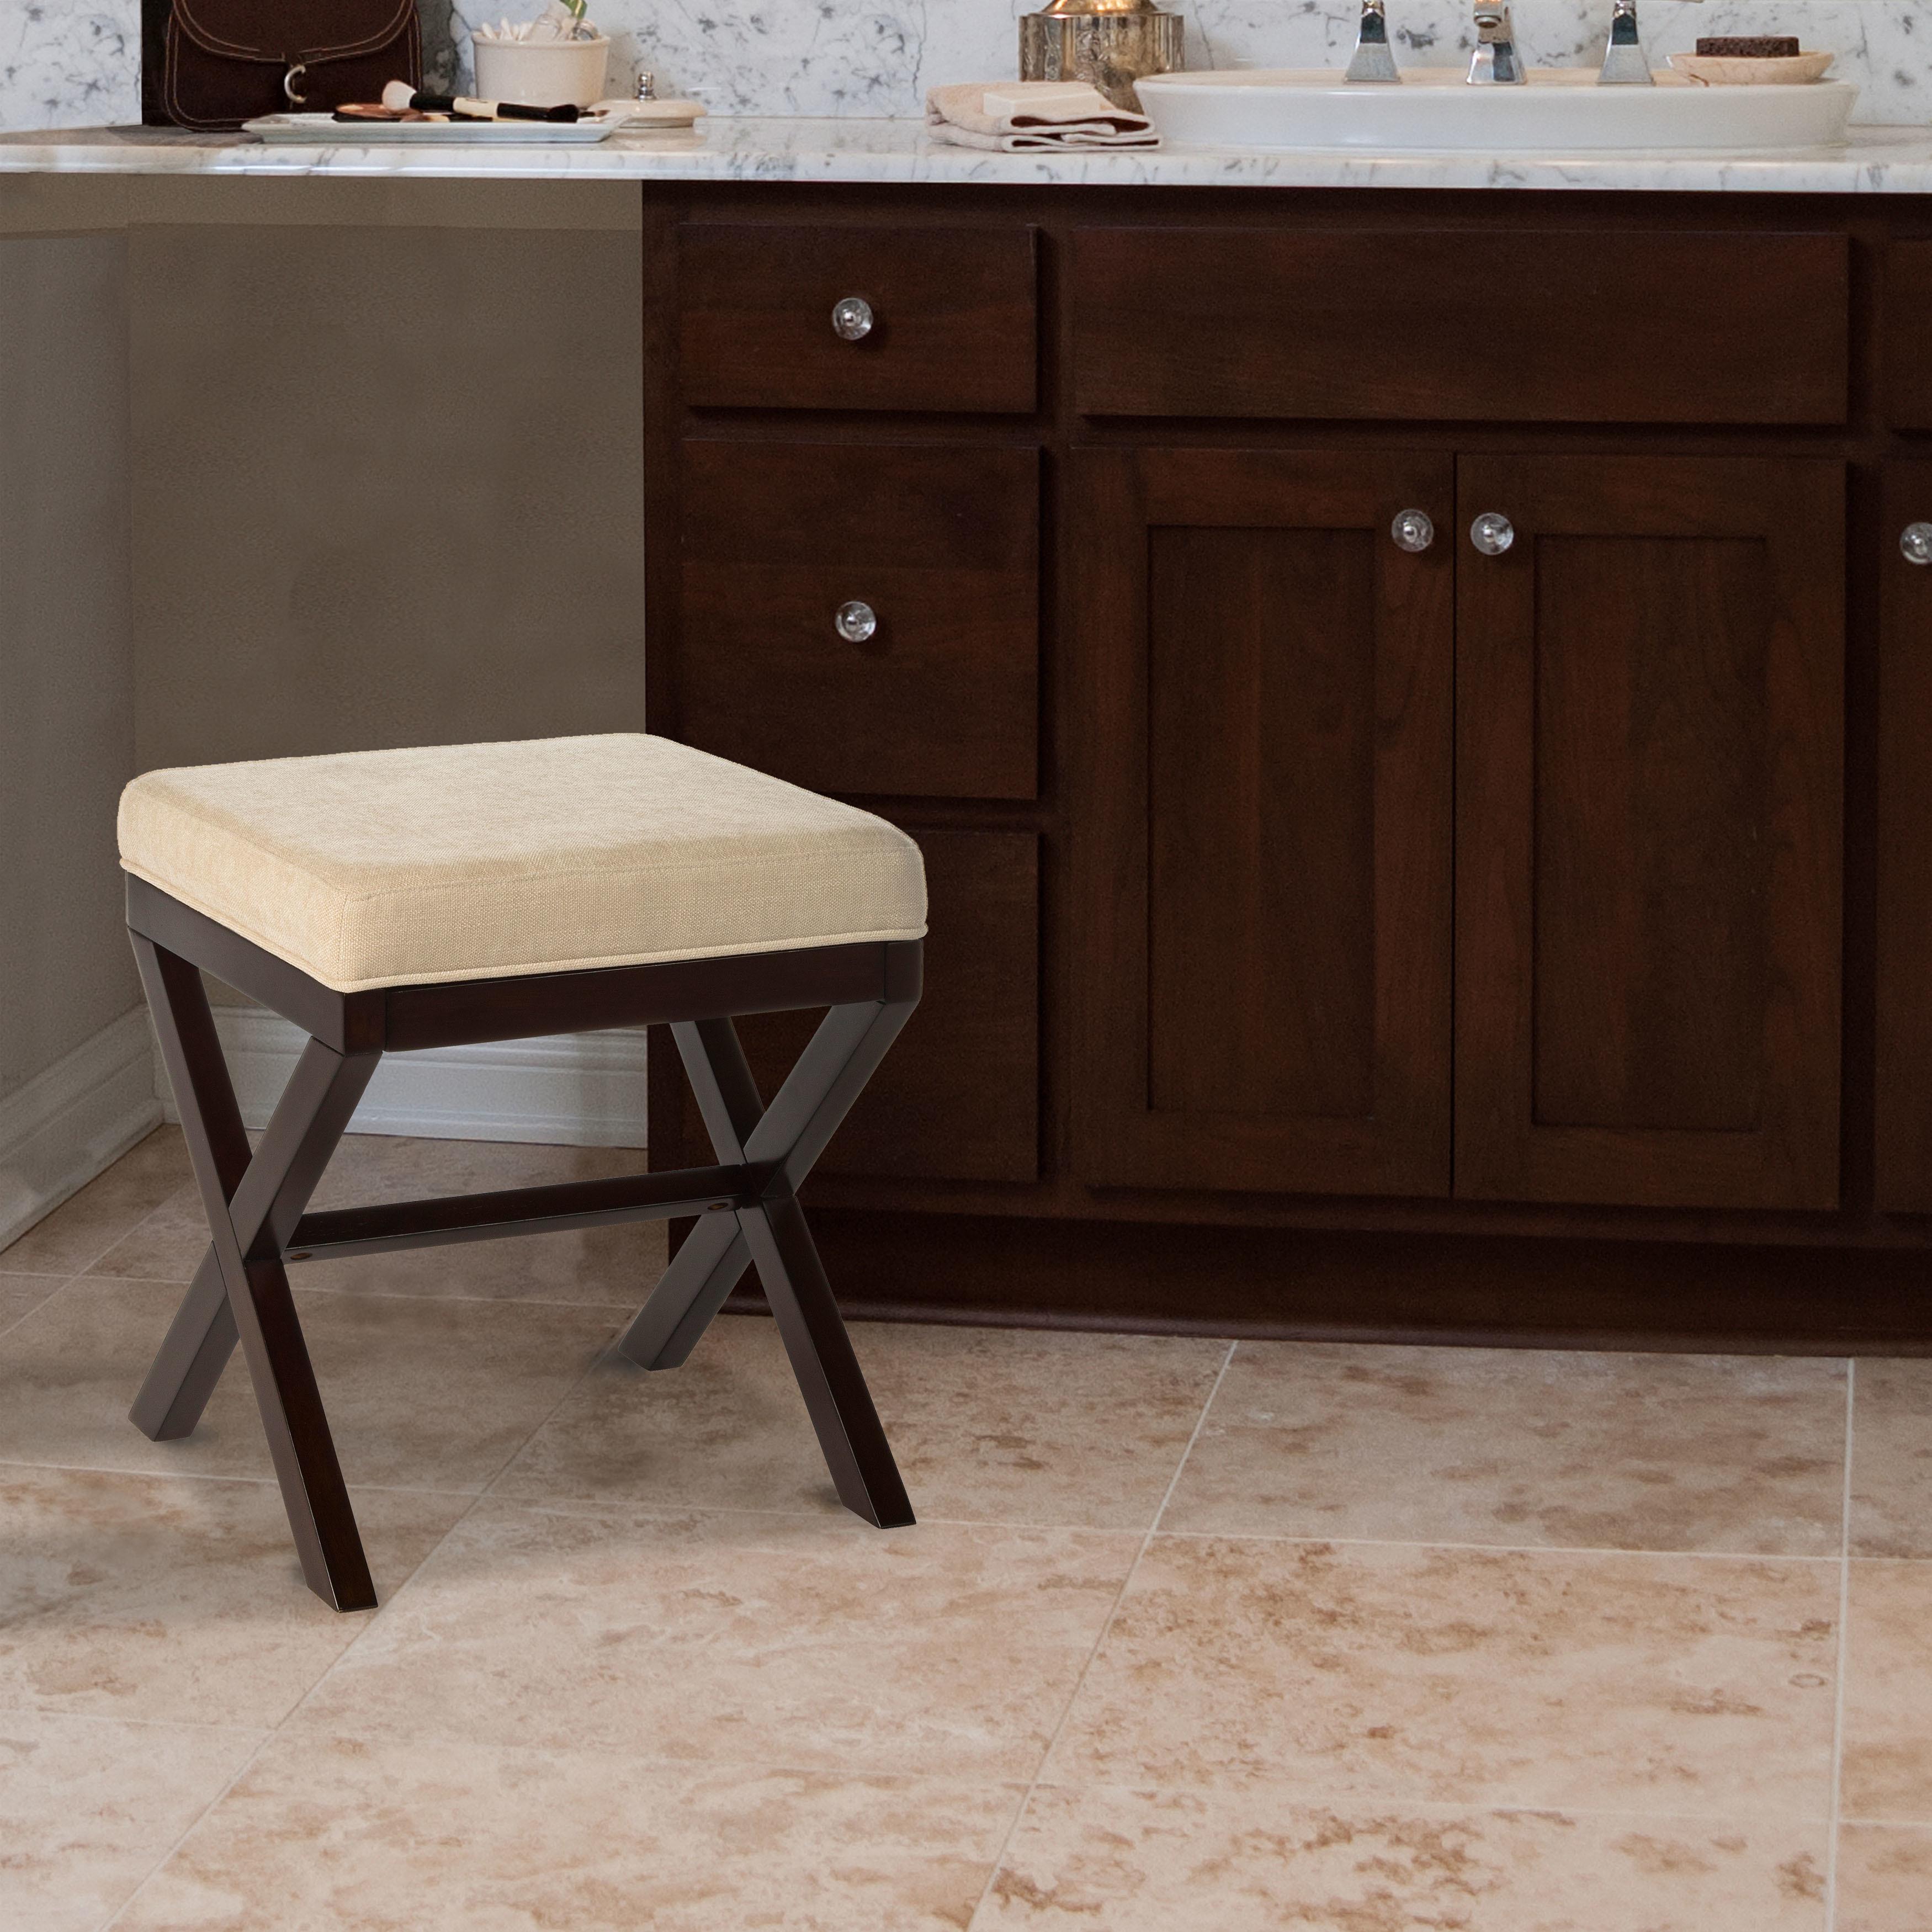 Gracewood Hollow Gikandi Wood Vanity Stool in Espresso Finish